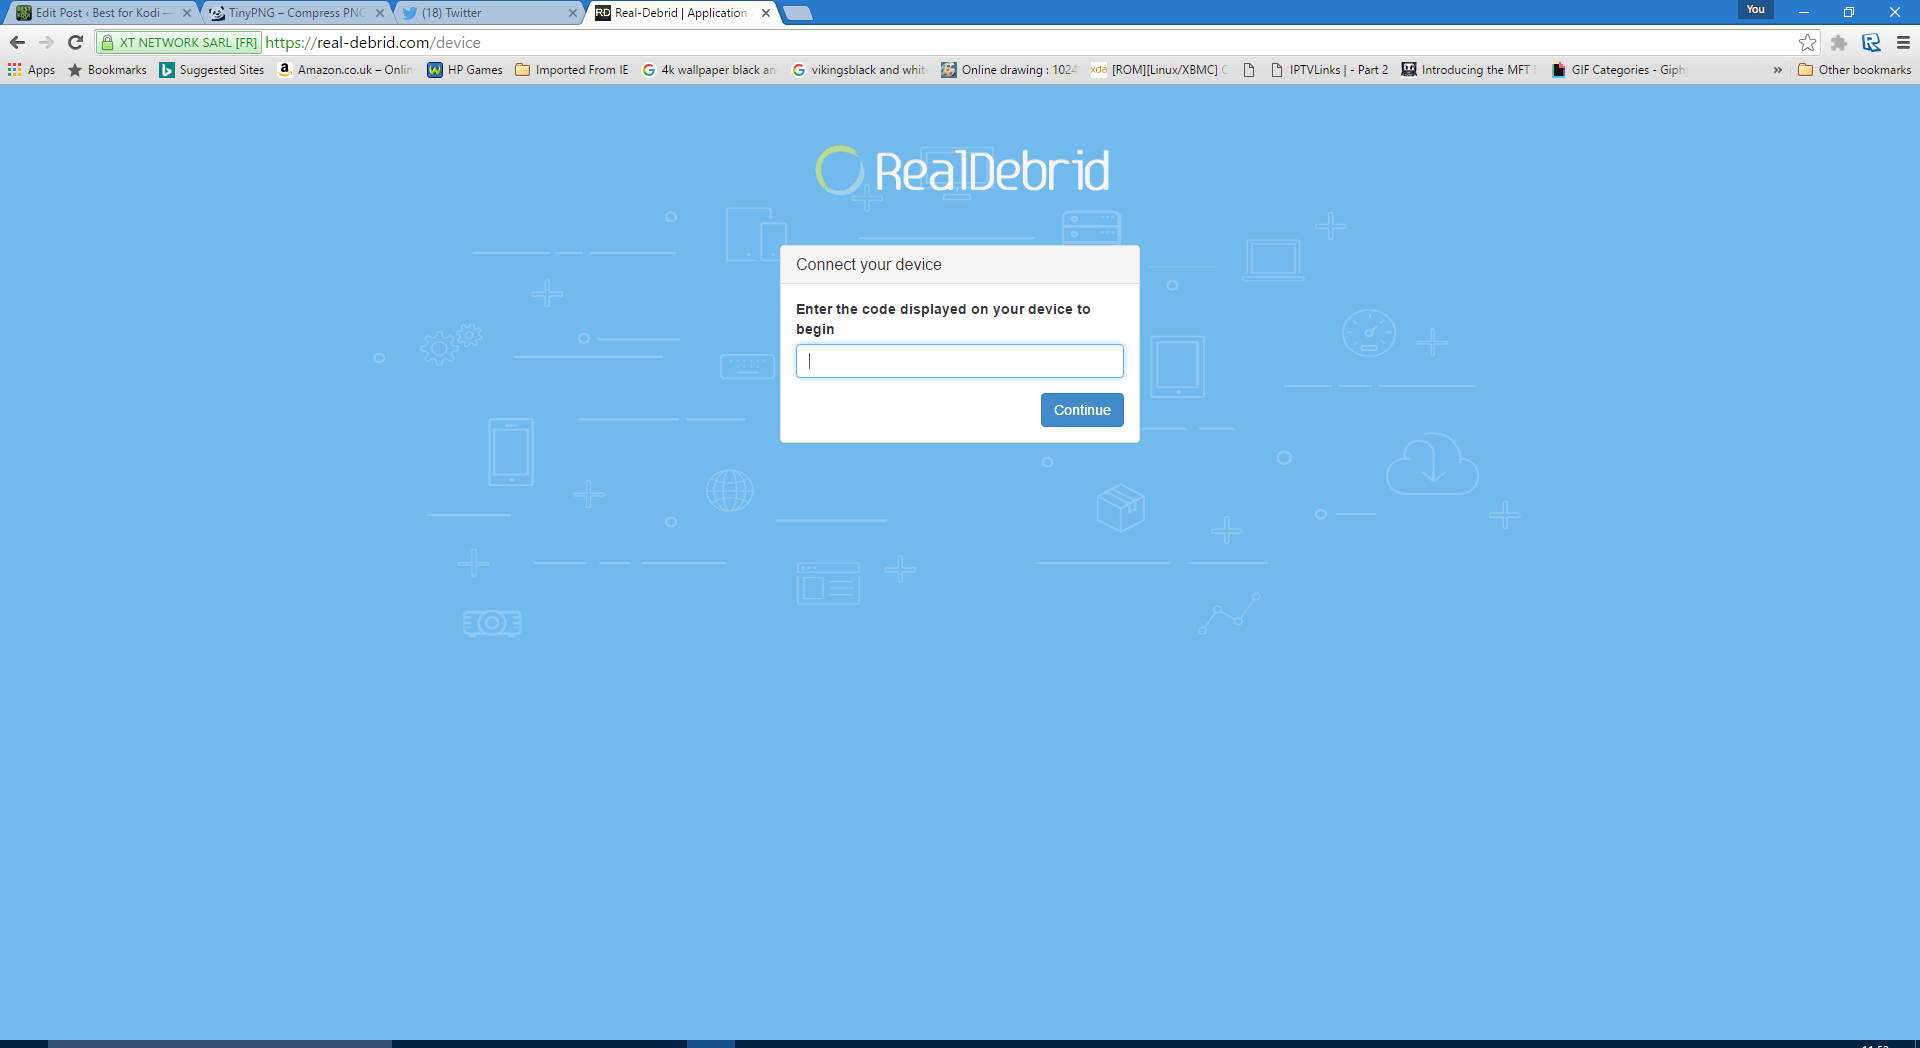 Screenshot 2016-06-23 11.53.49